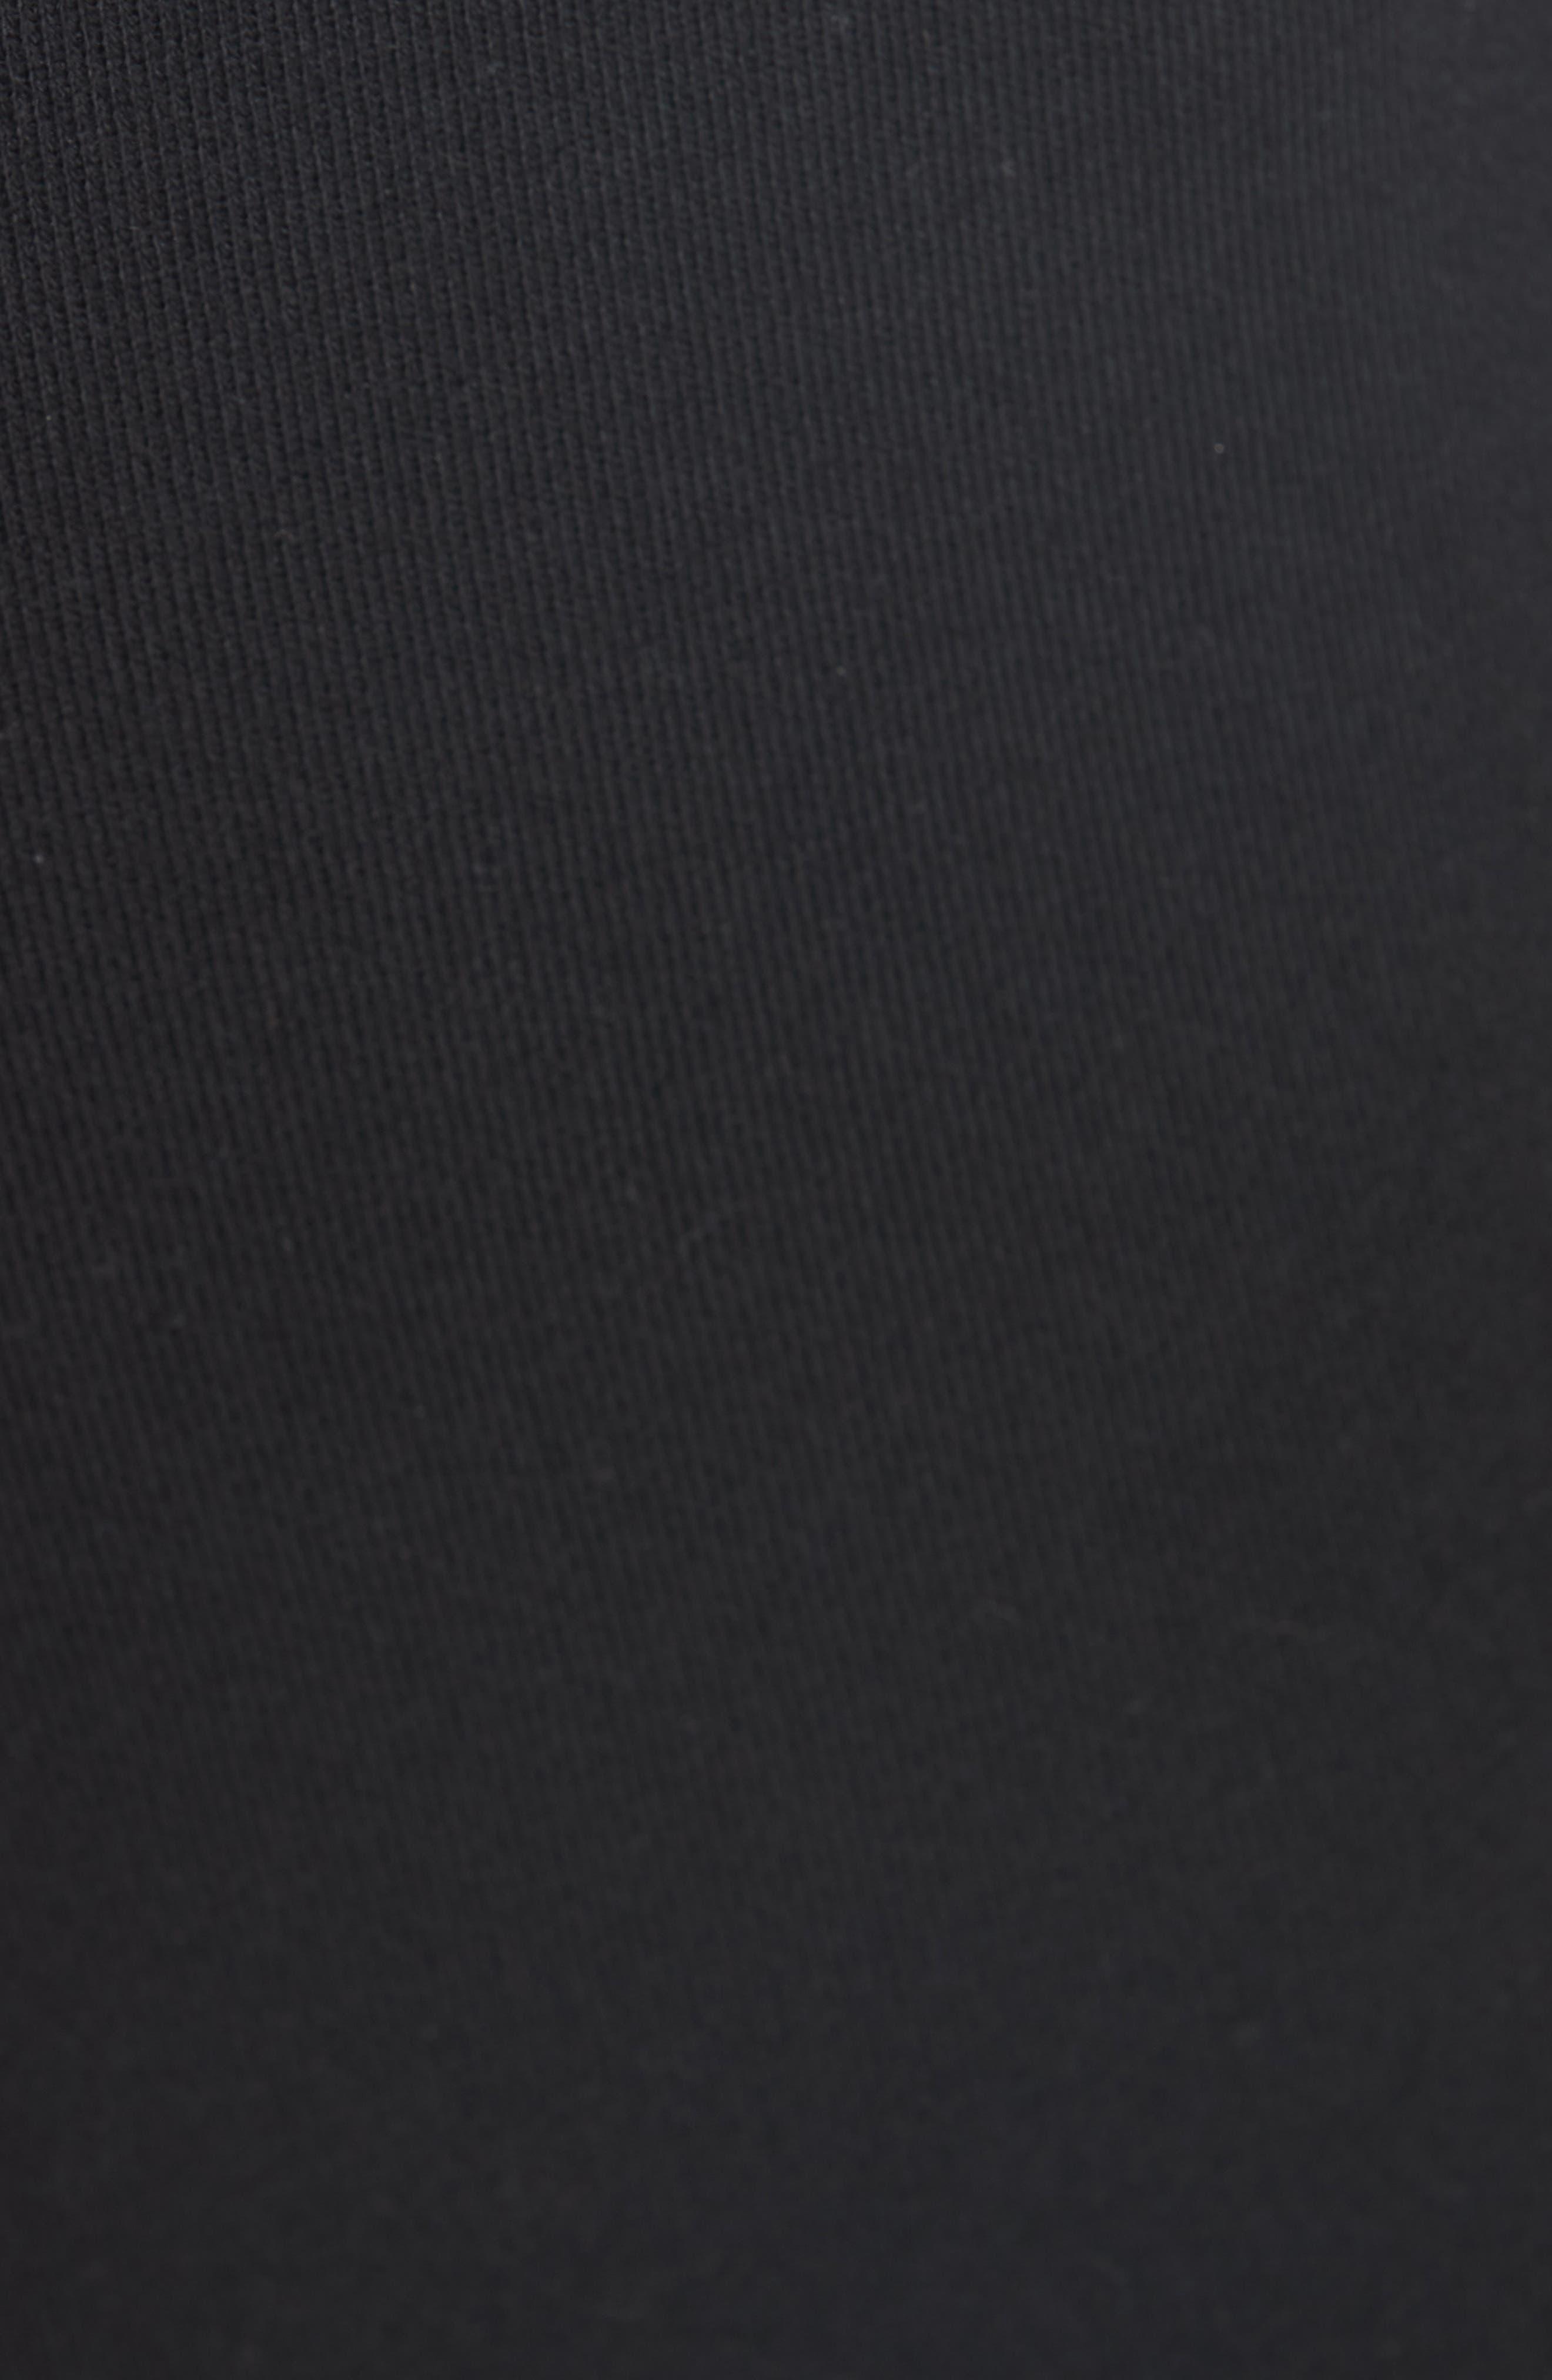 Escobar Sweatpants,                             Alternate thumbnail 5, color,                             BLACK